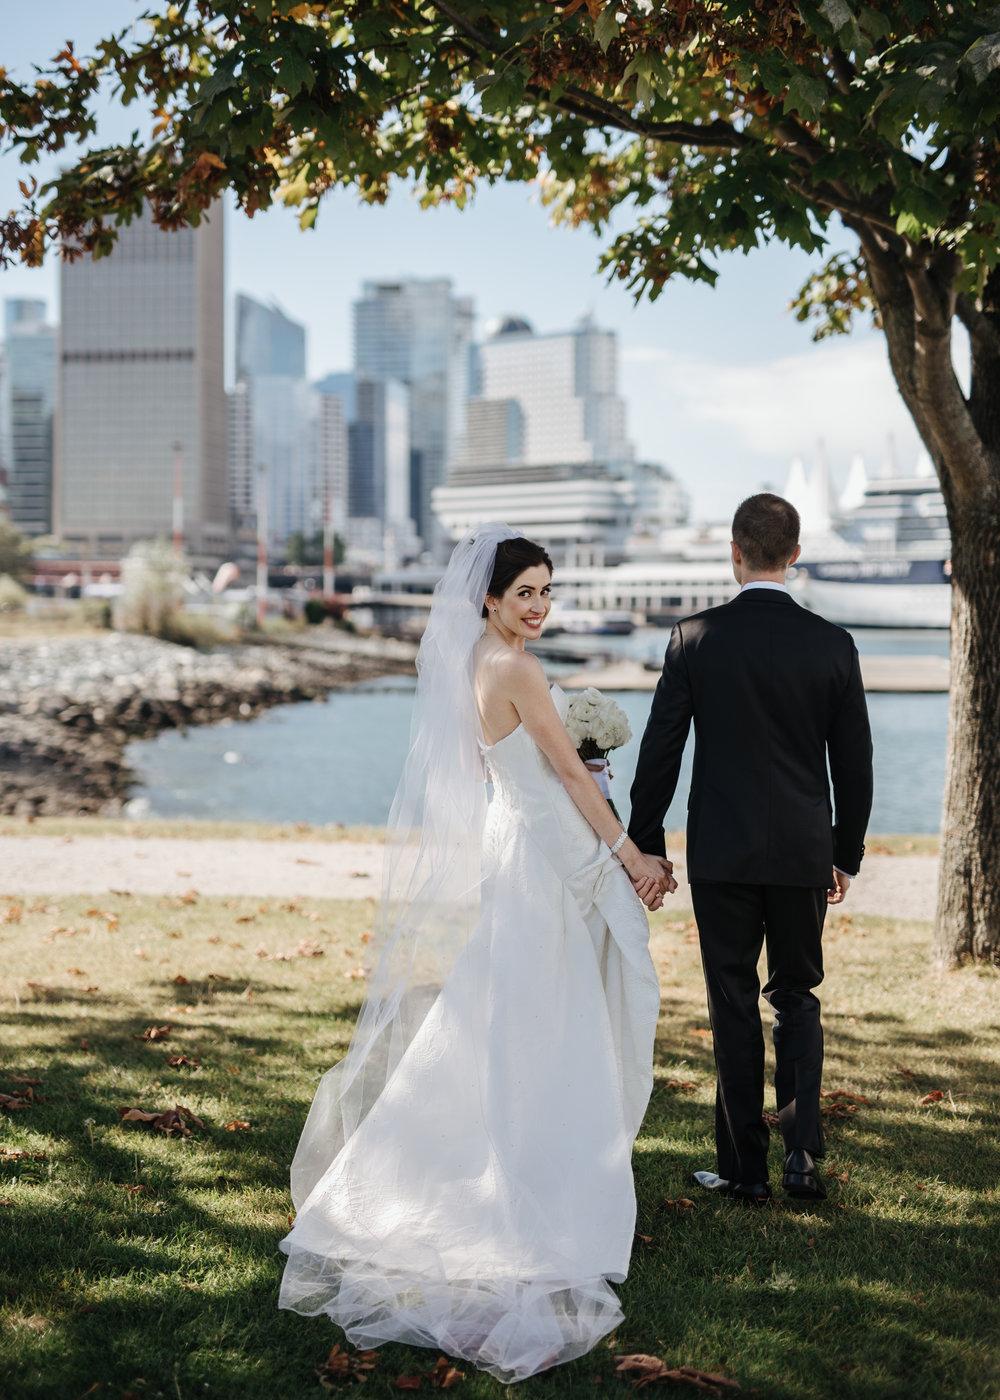 herafilms_jacqueline_brandon_wedding_heraselects-41.jpg